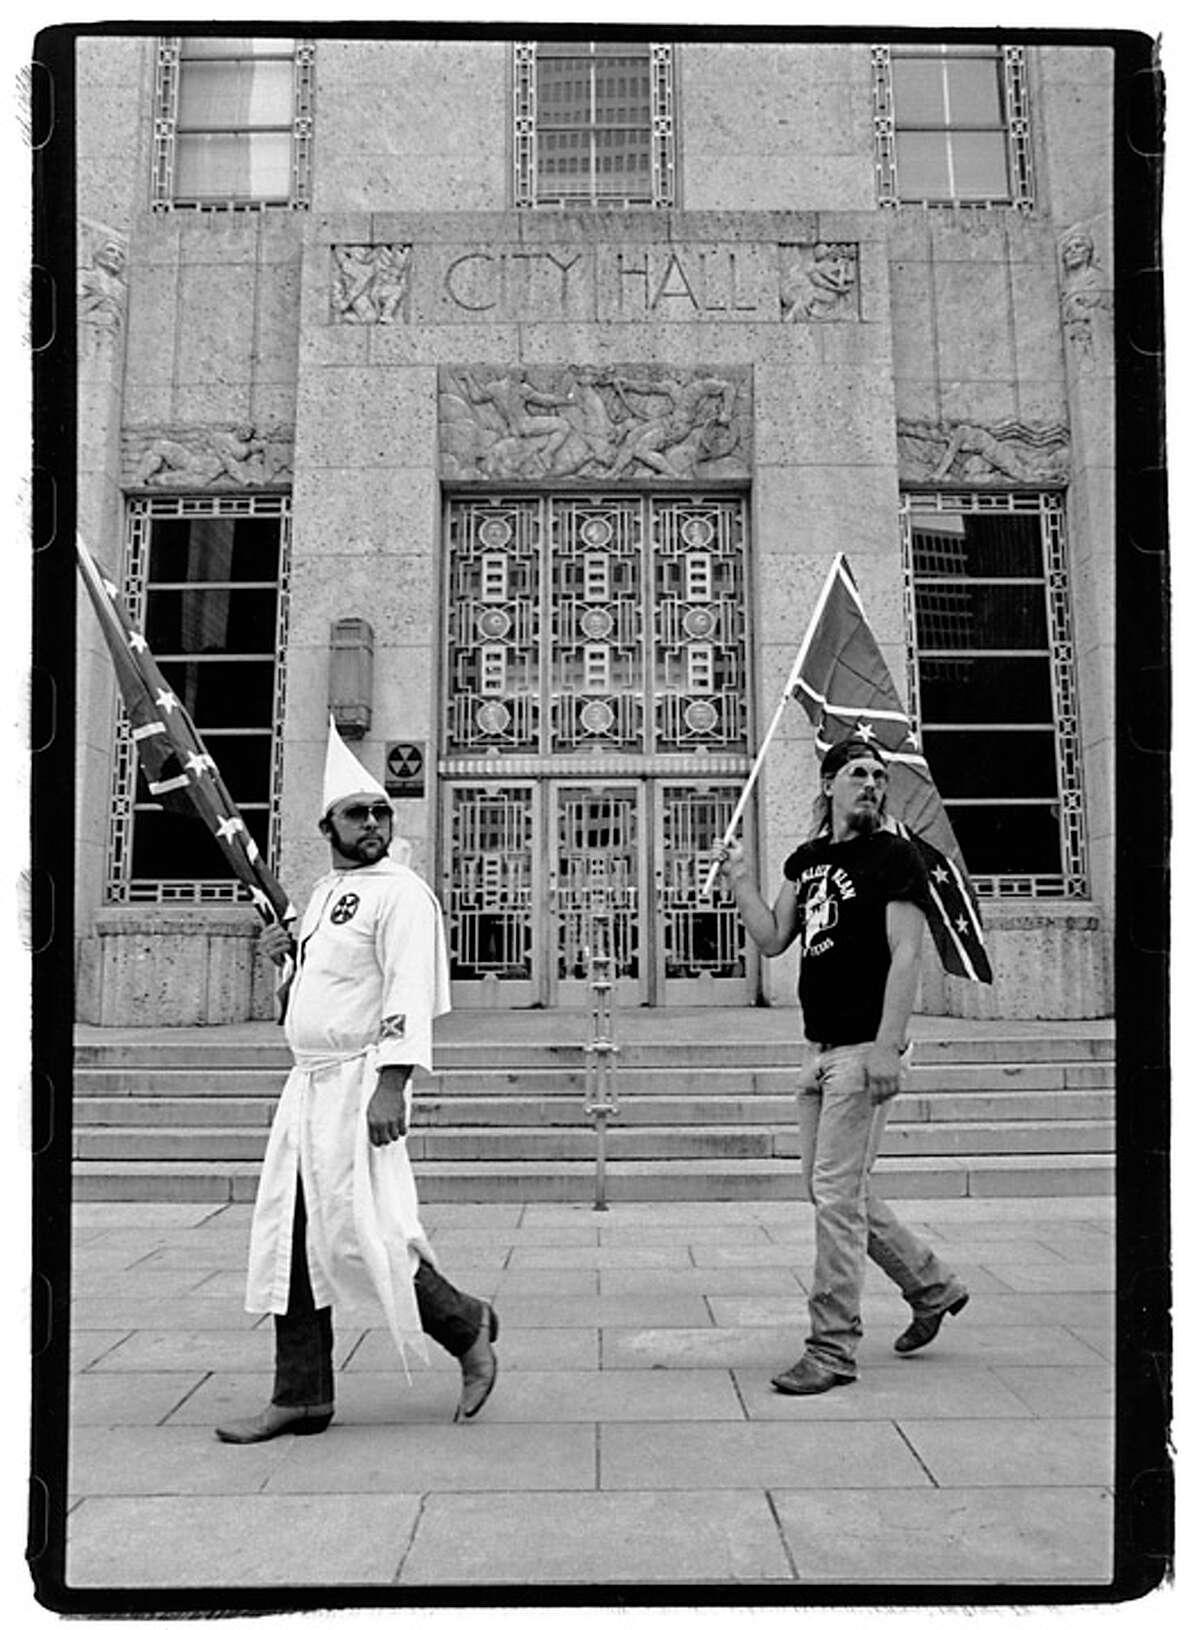 A KKK march at Houston City Hall.